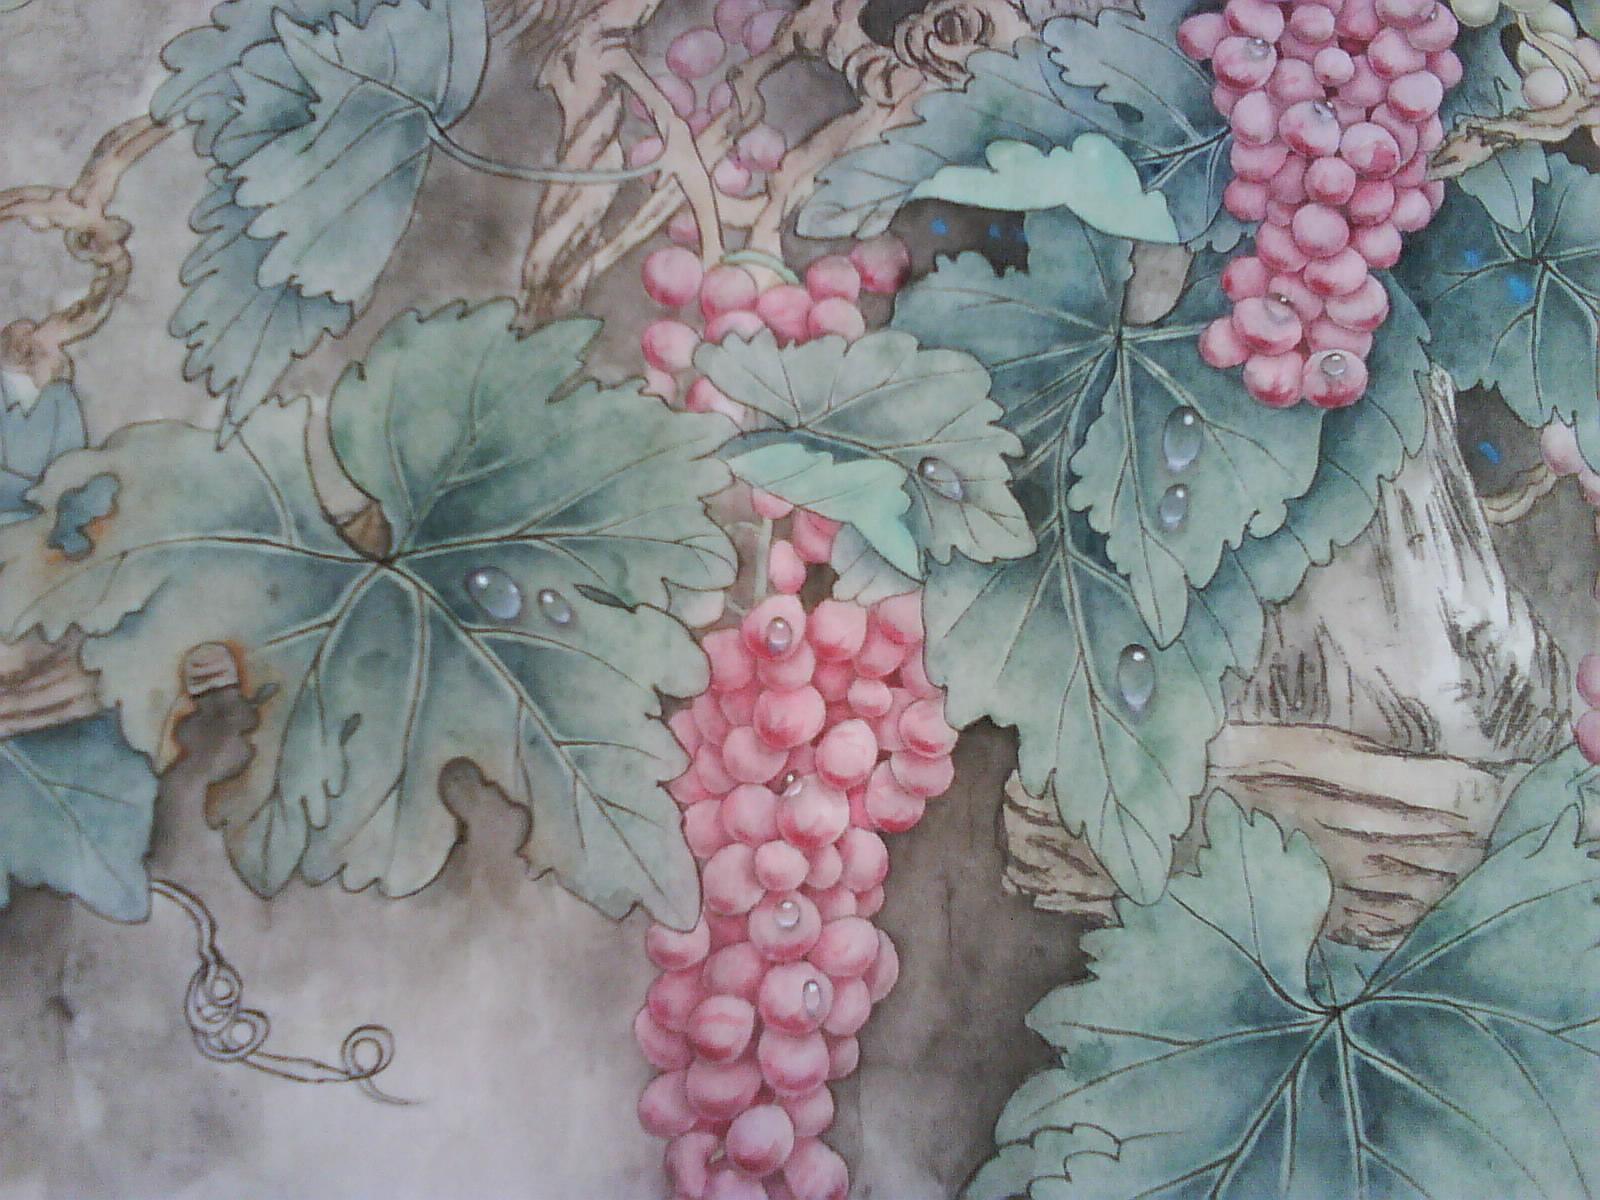 工笔画葡萄